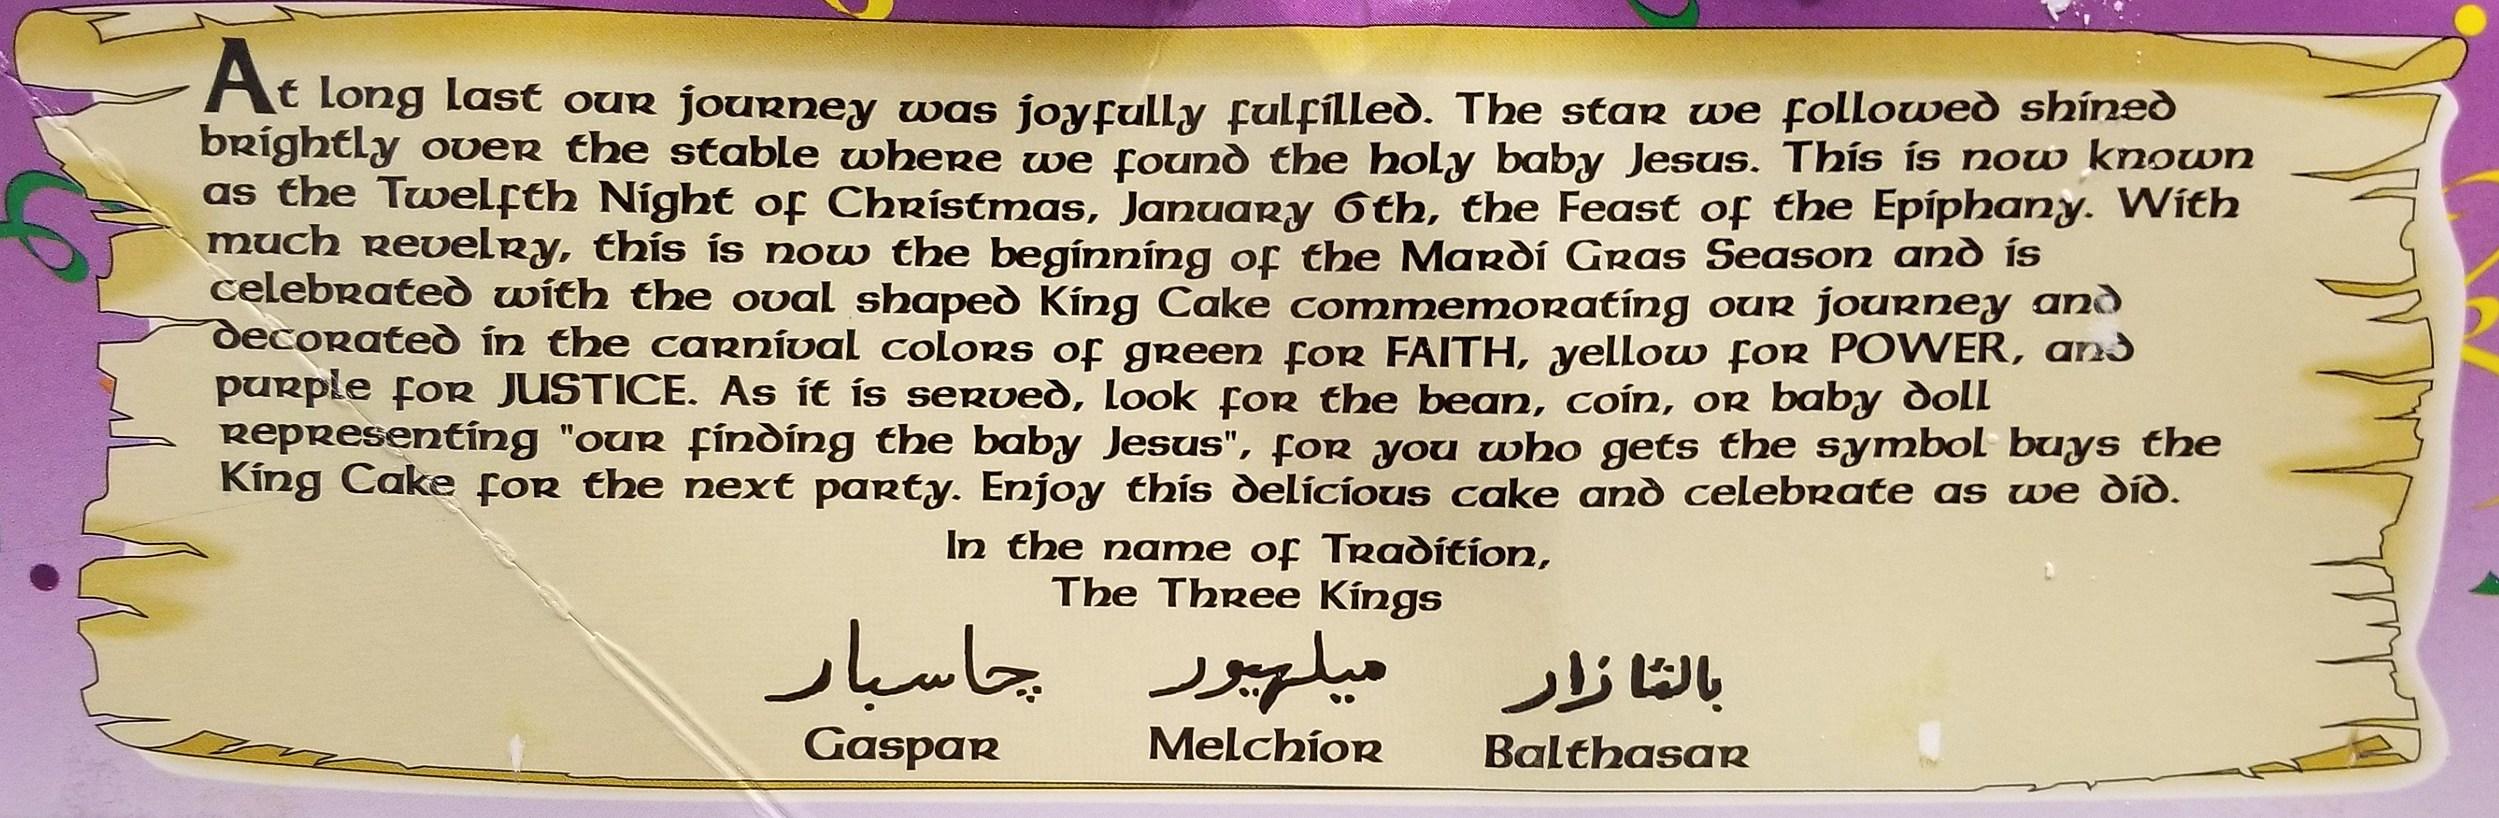 King Cake story